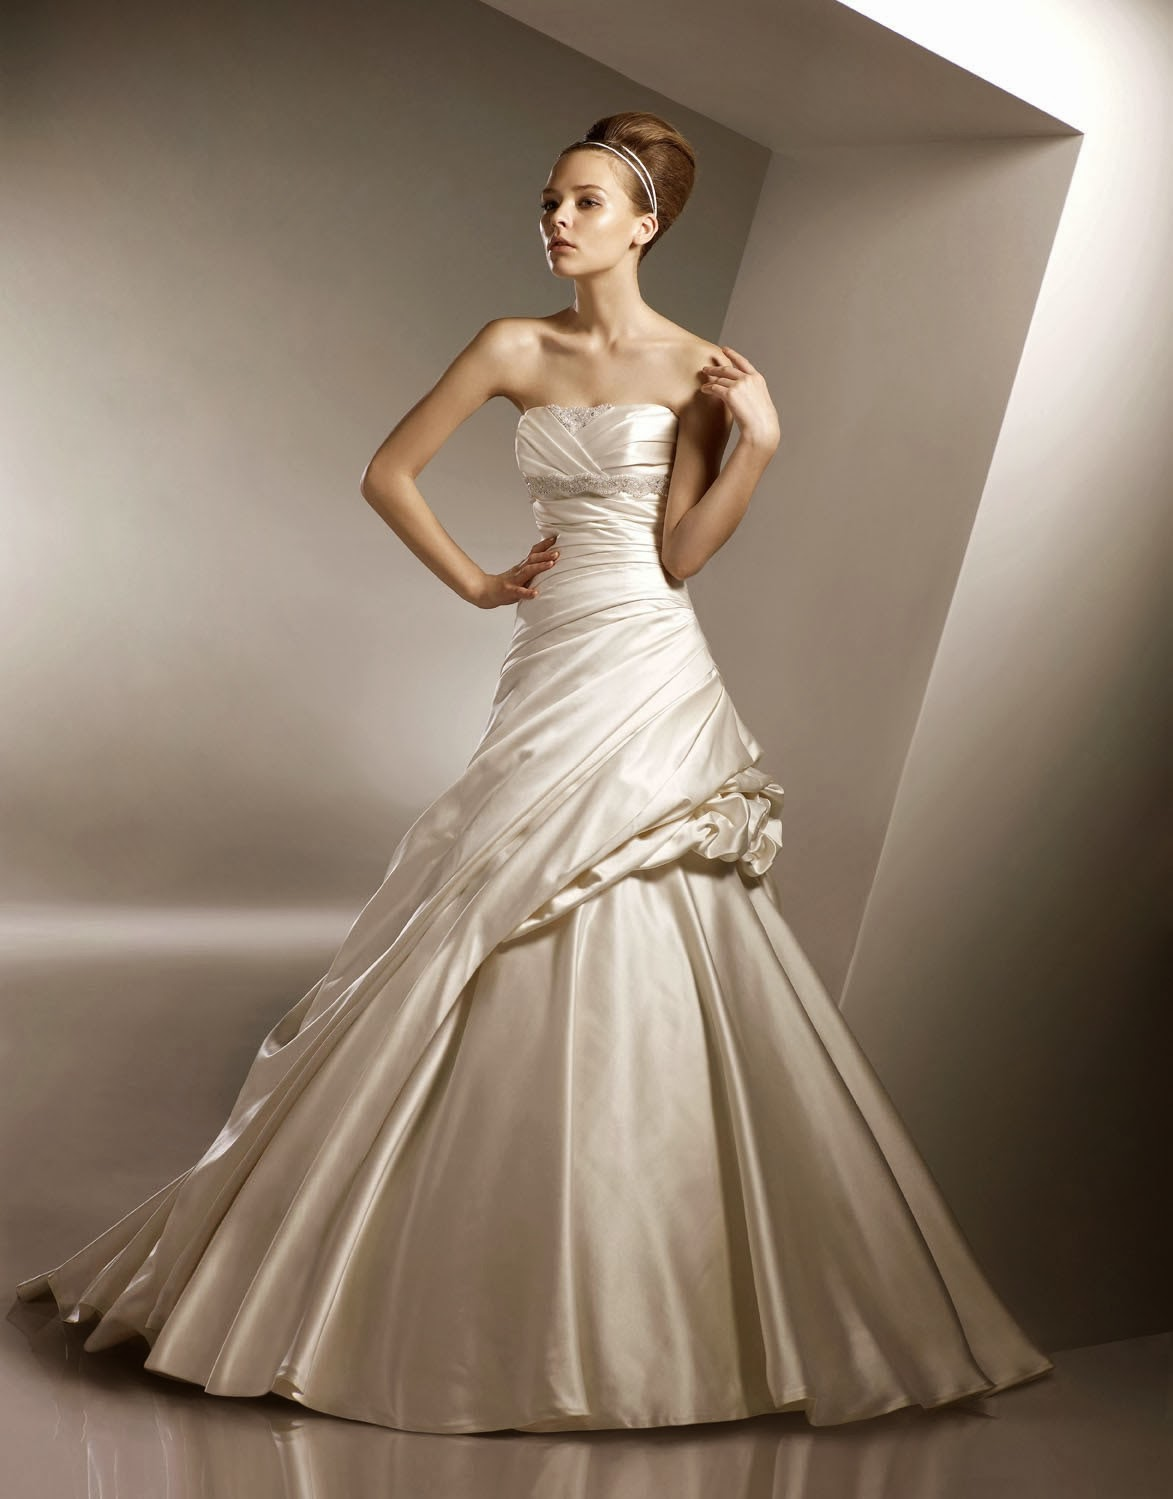 Model Royal Blue Prom Dress 2015 PM6474 Elegant Long Mermaid Prom Dresses Vestidos De Gala Gorgeous ...